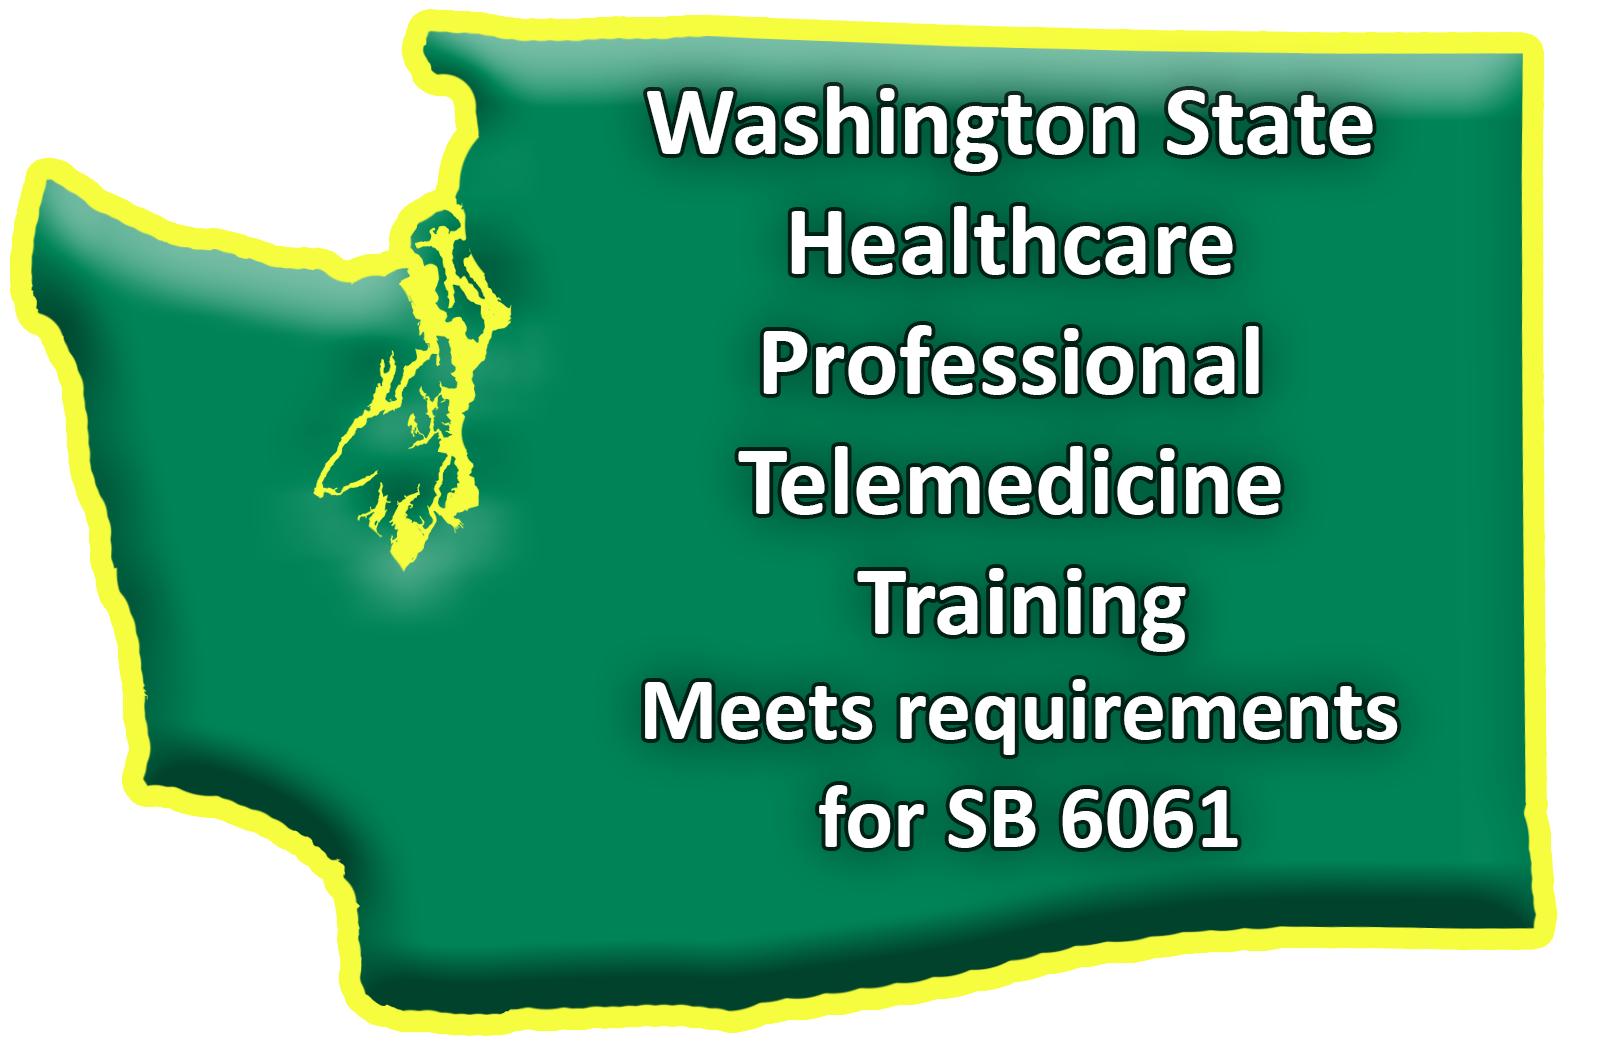 Washington State Healthcare Professional Telemedicine Training 1.5 CE